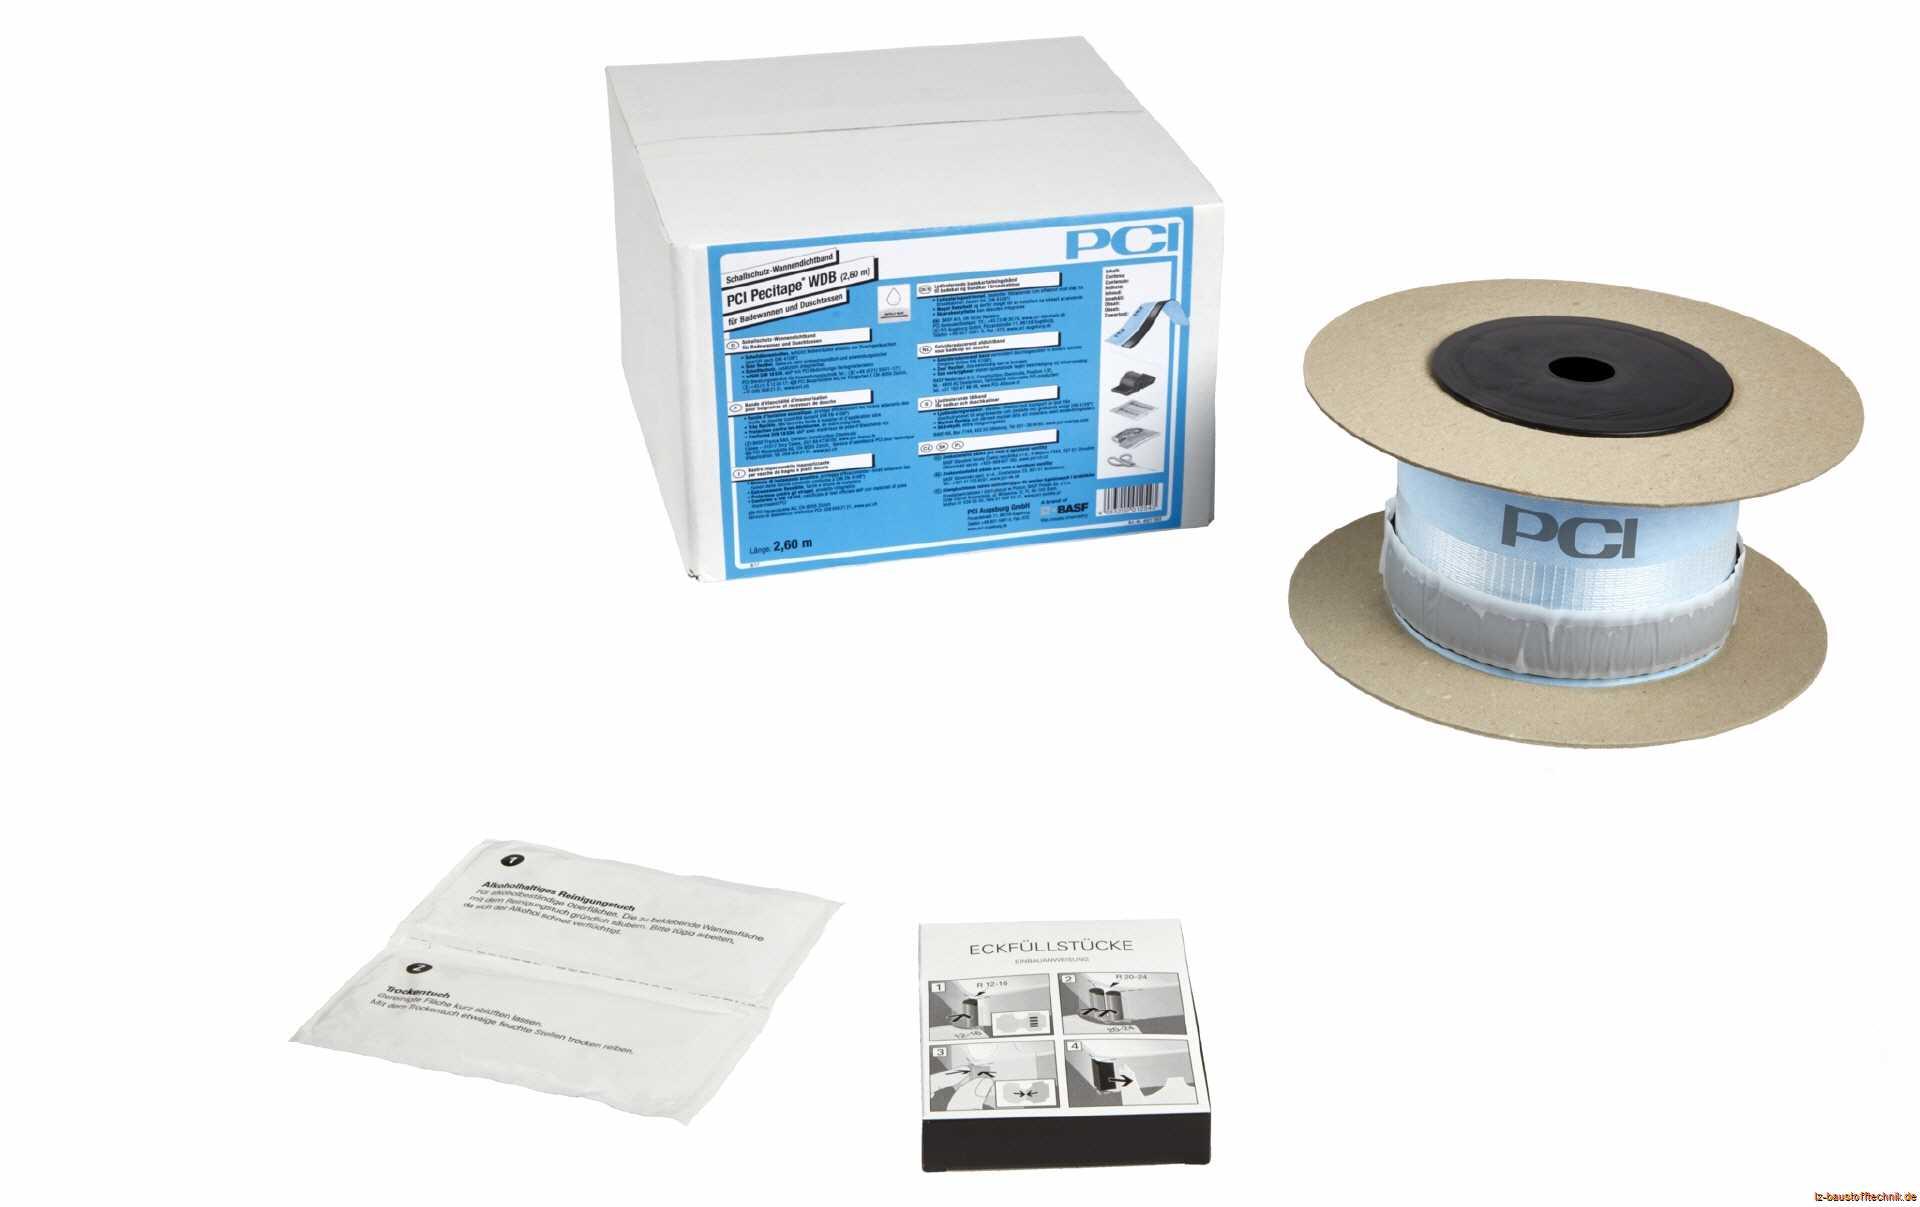 100 SMD Kondensatoren Ceramic Capacitors Chip 0805 NP0 2,7pF 50V 058146